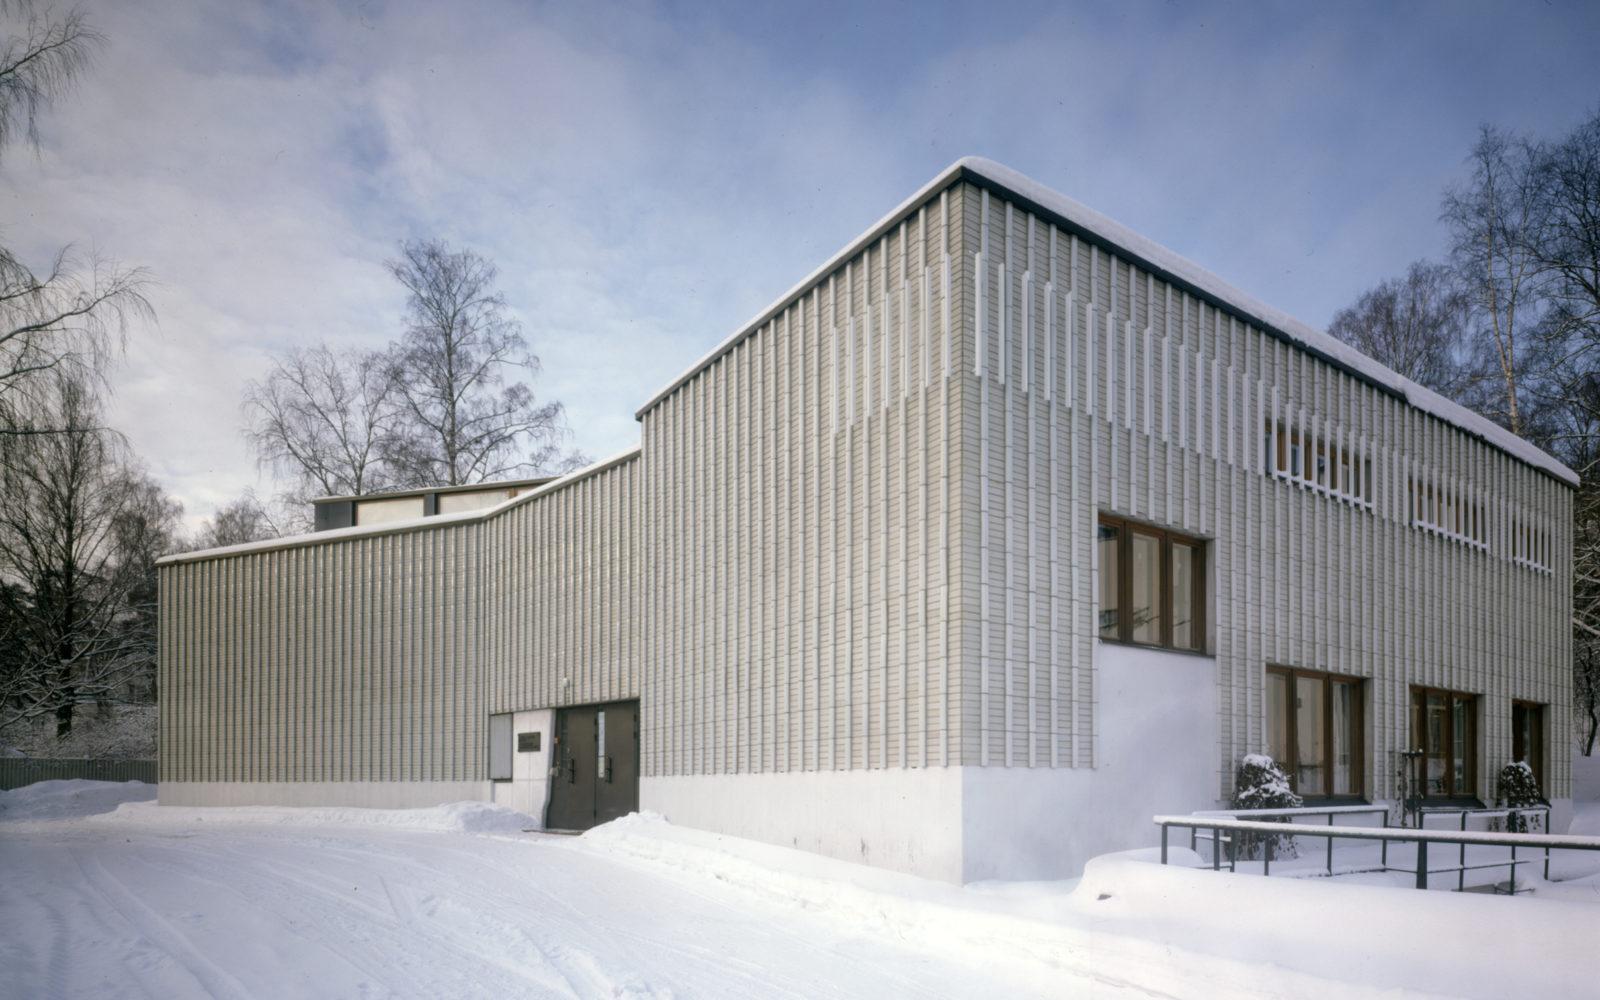 alvar-aalto-museum-winter-photo-maija-holma-alvar-aalto-museum